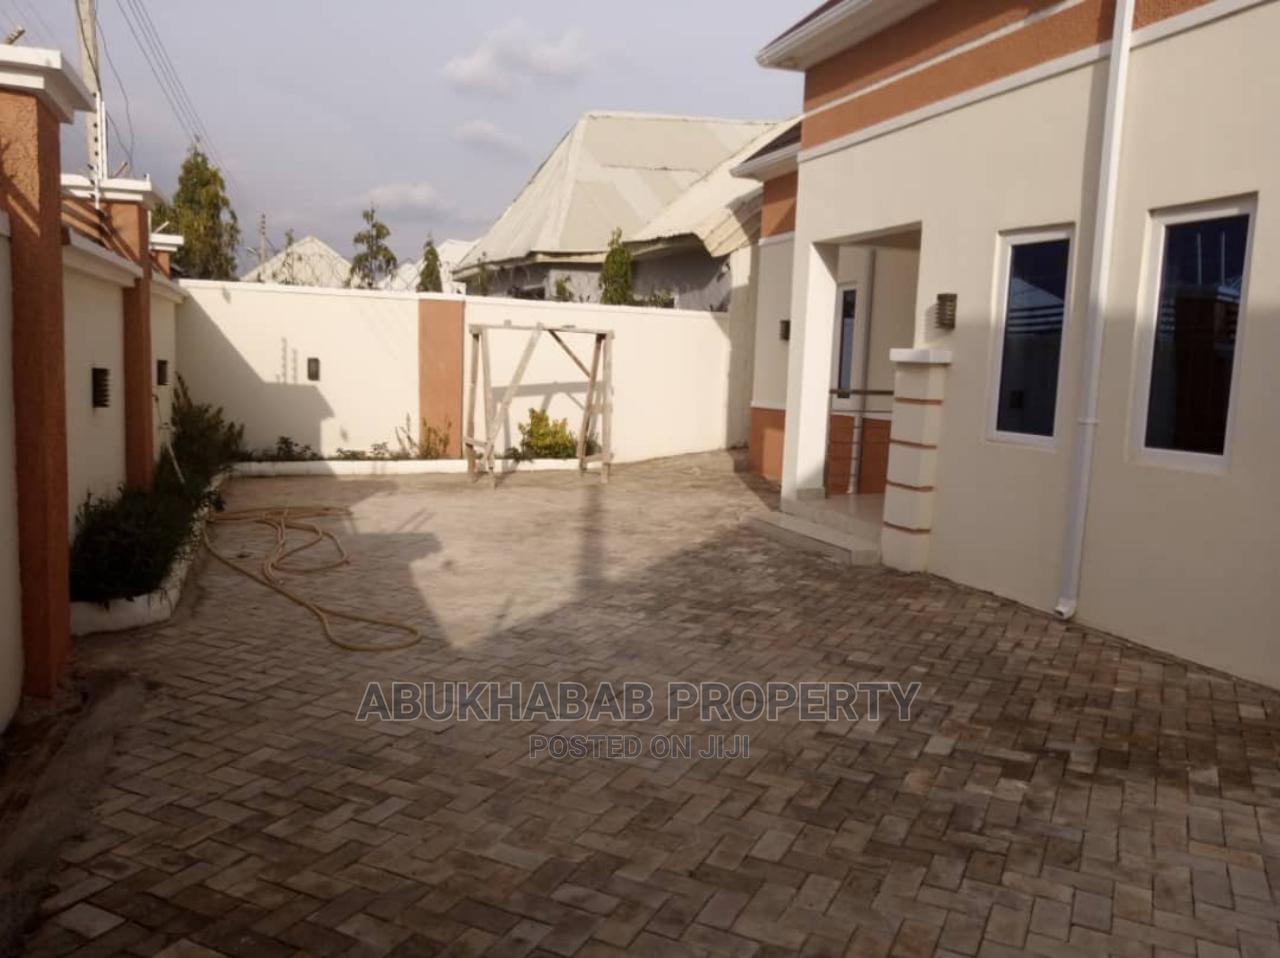 Furnished 3bdrm Bungalow in Mhp, Kaduna / Kaduna State for Sale